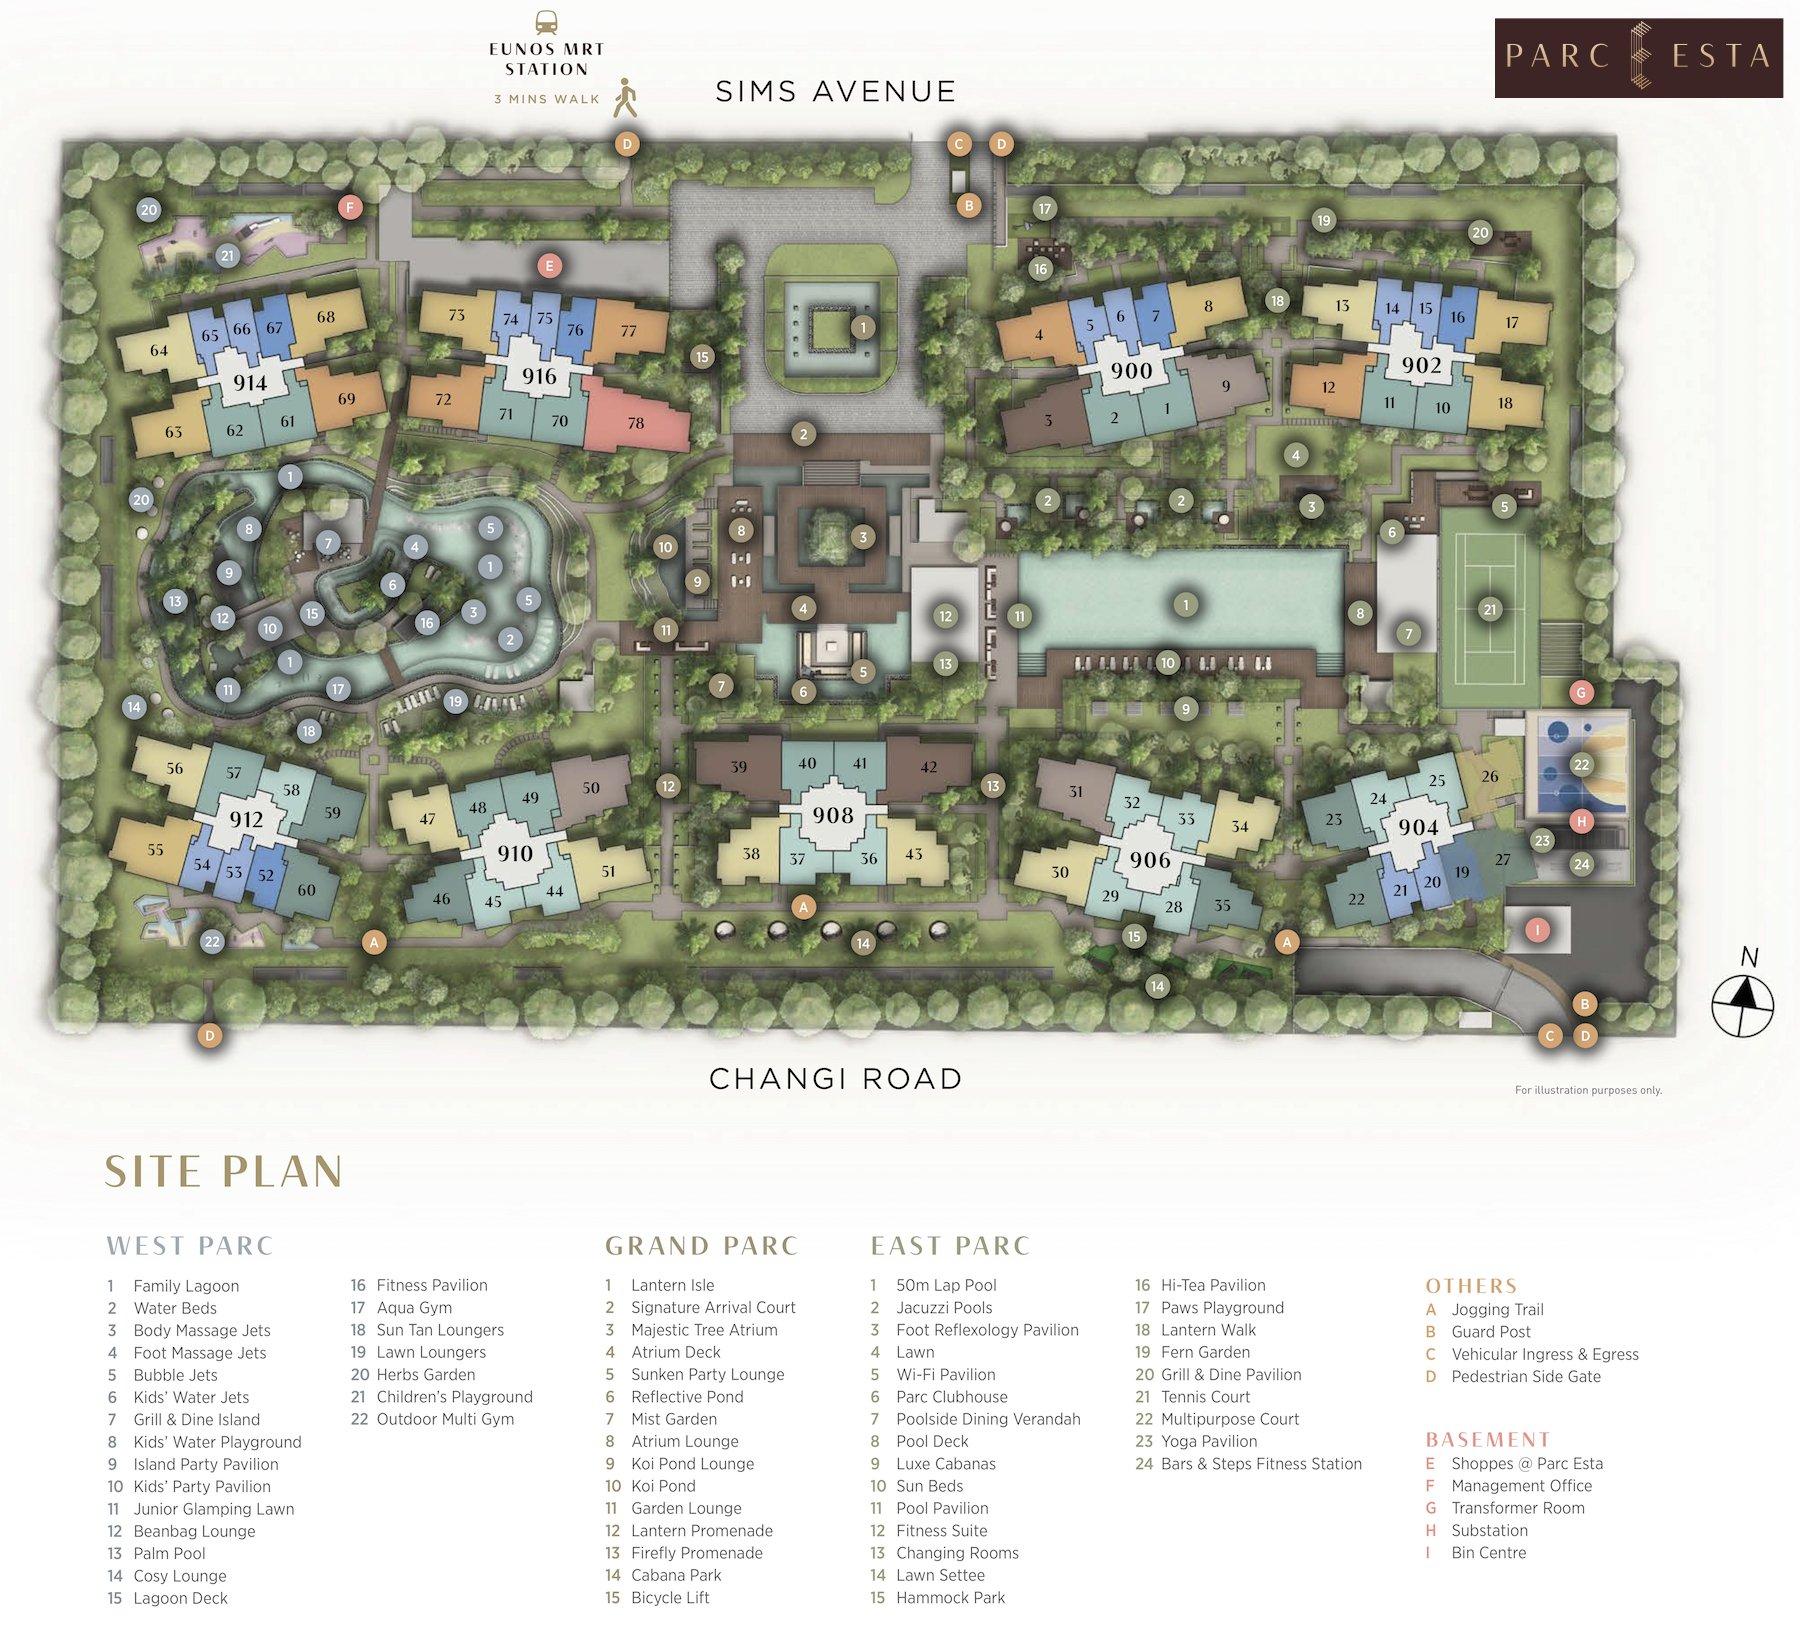 Parc Esta 东景苑 site plan 平面设计图